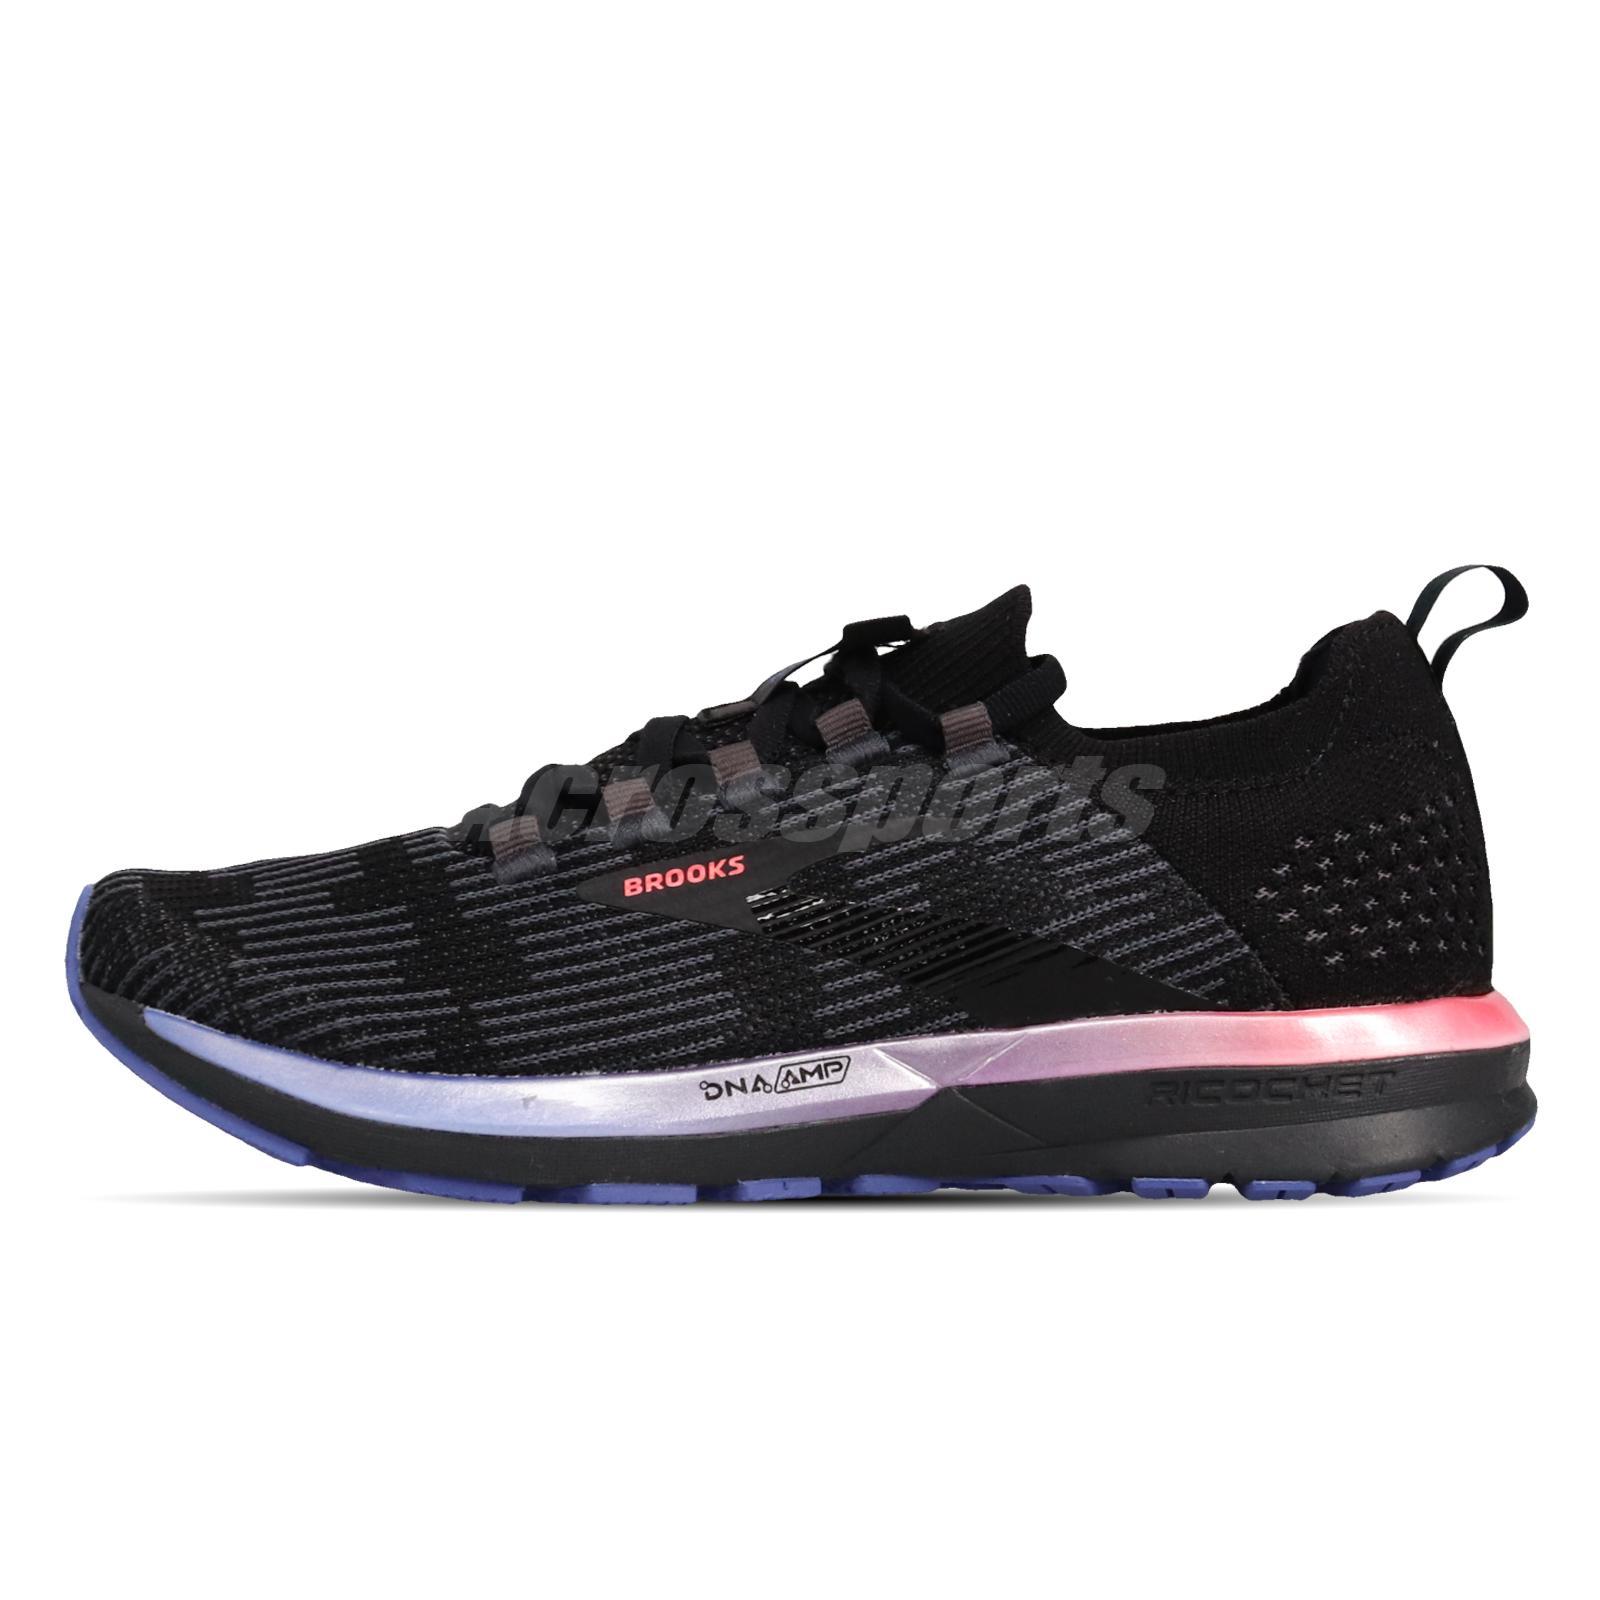 Brooks Ricochet 2 Black Blue Pink Womens Running Shoes Fit Knit 120303-1B-015